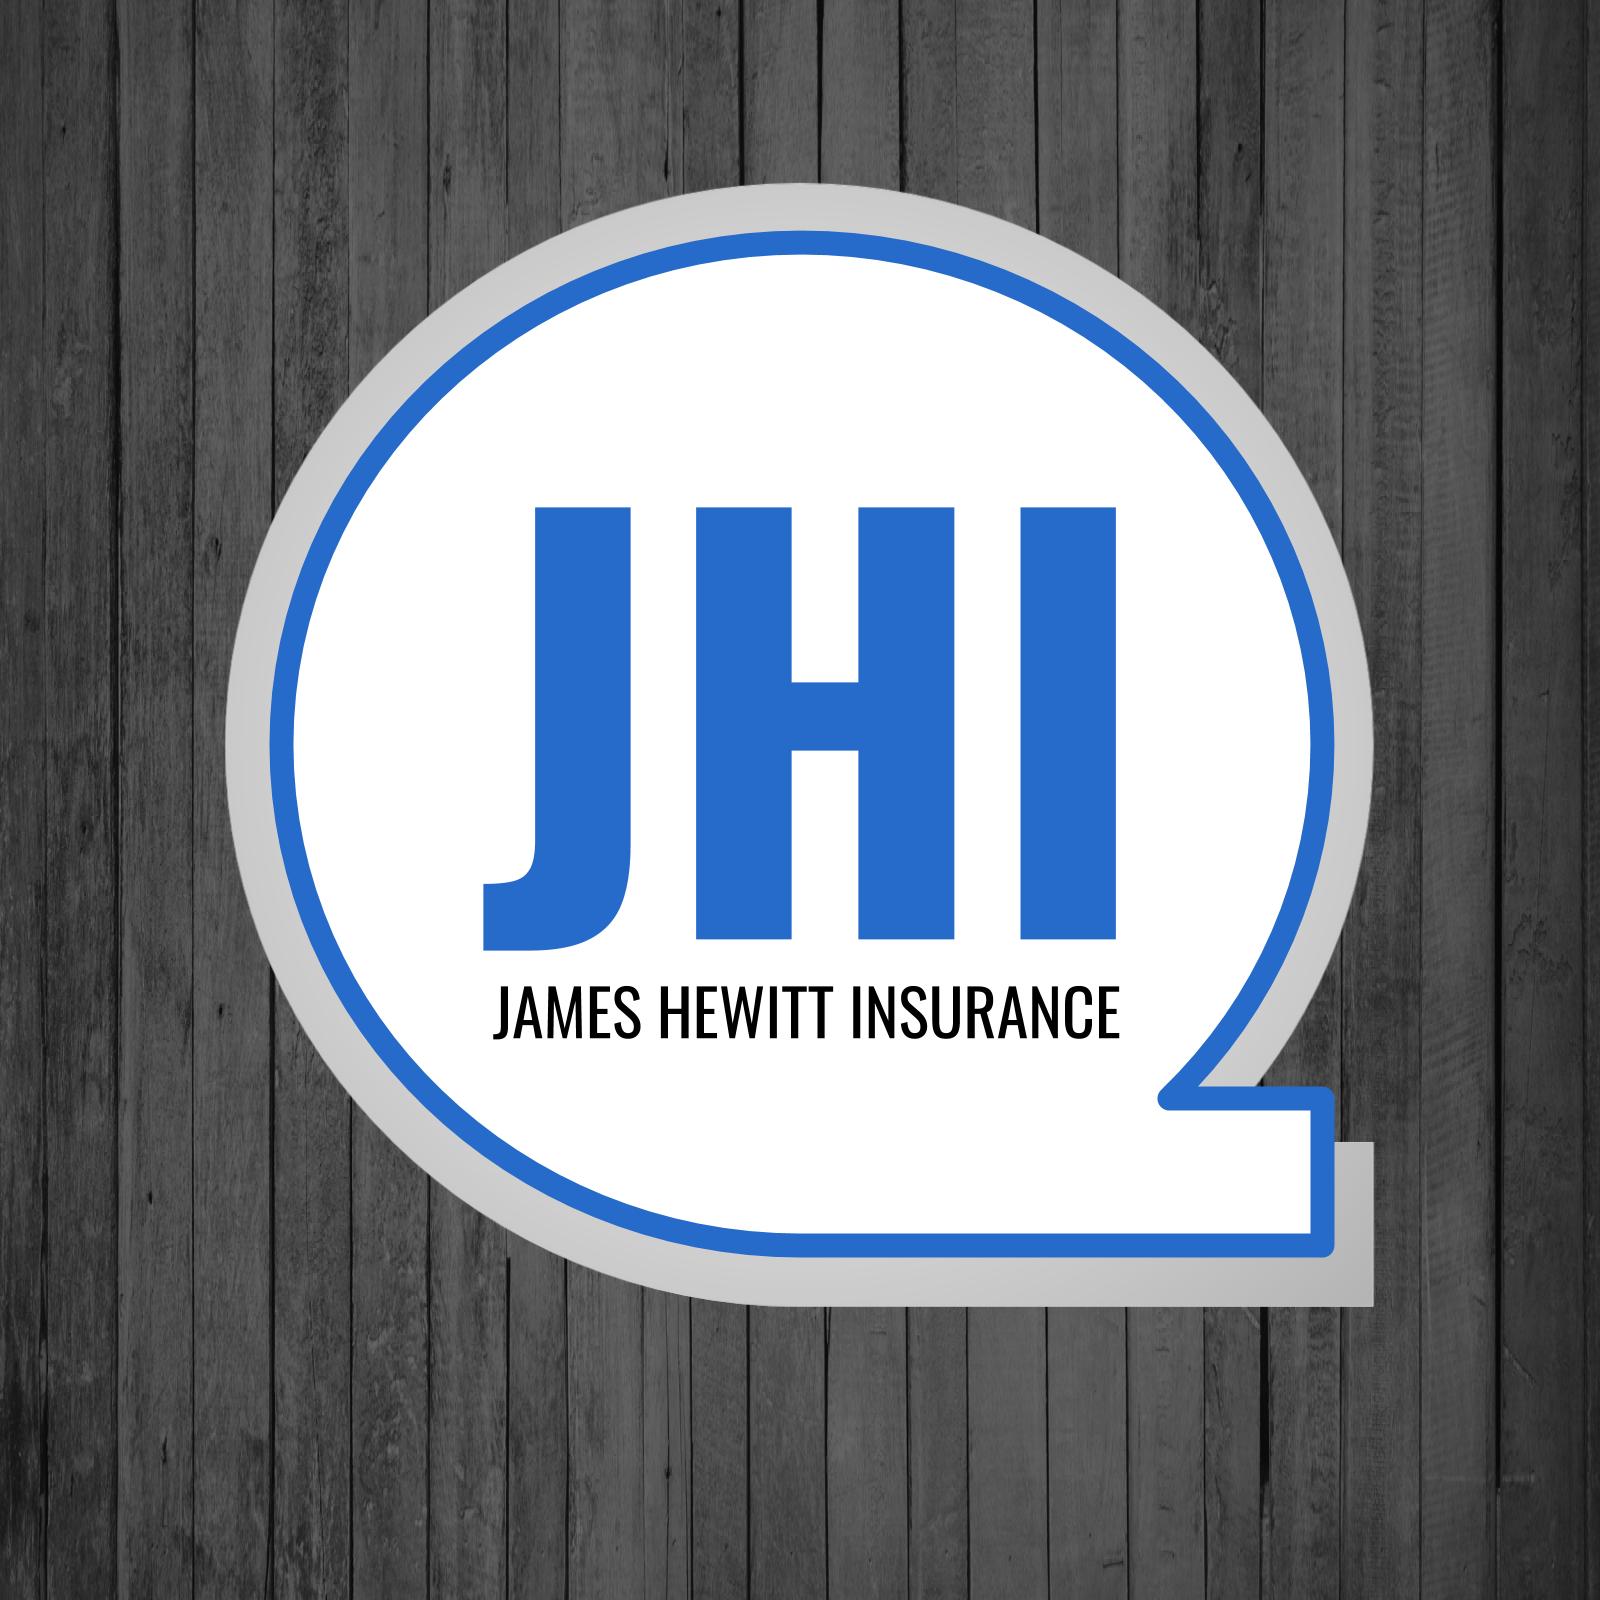 James Hewitt Insurance image 22